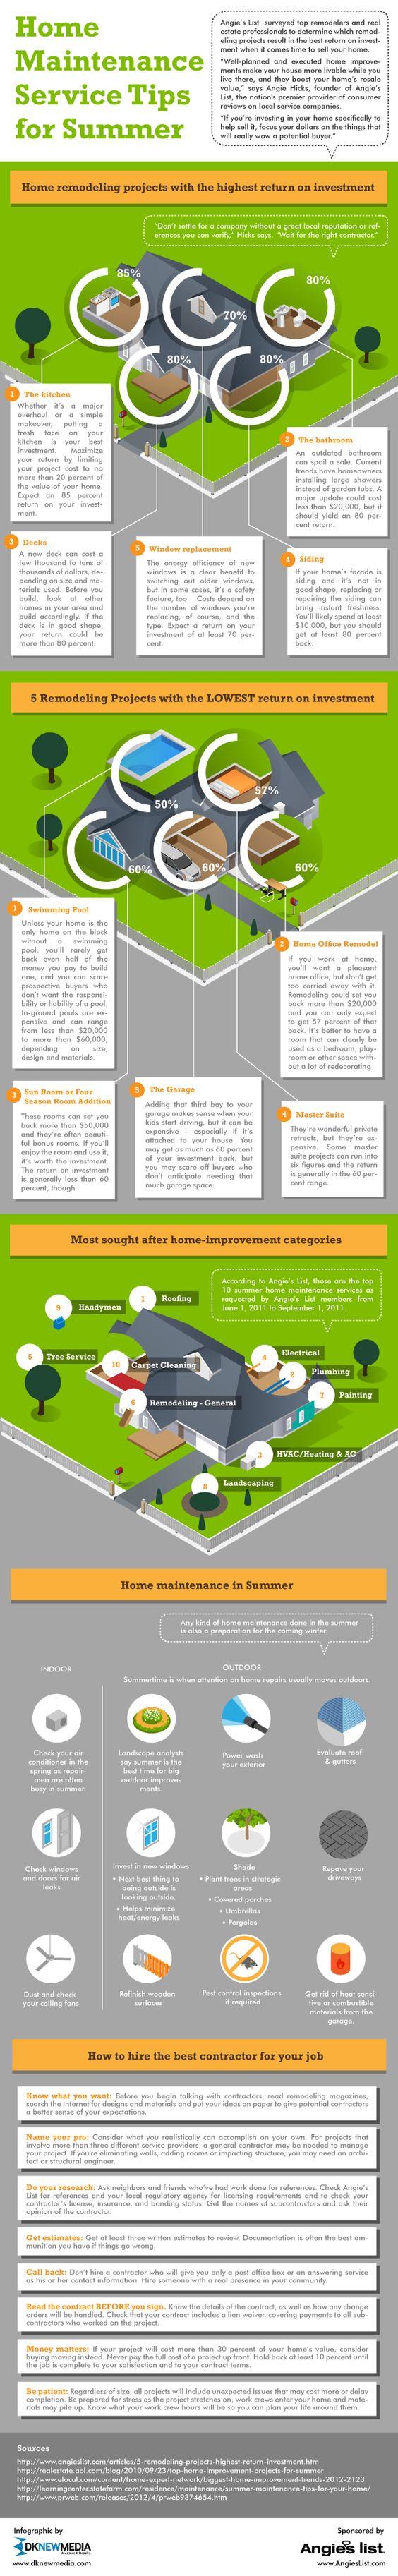 Aspectos reforma de su hogar infograf a reformas madrid - Reformas hogar madrid ...